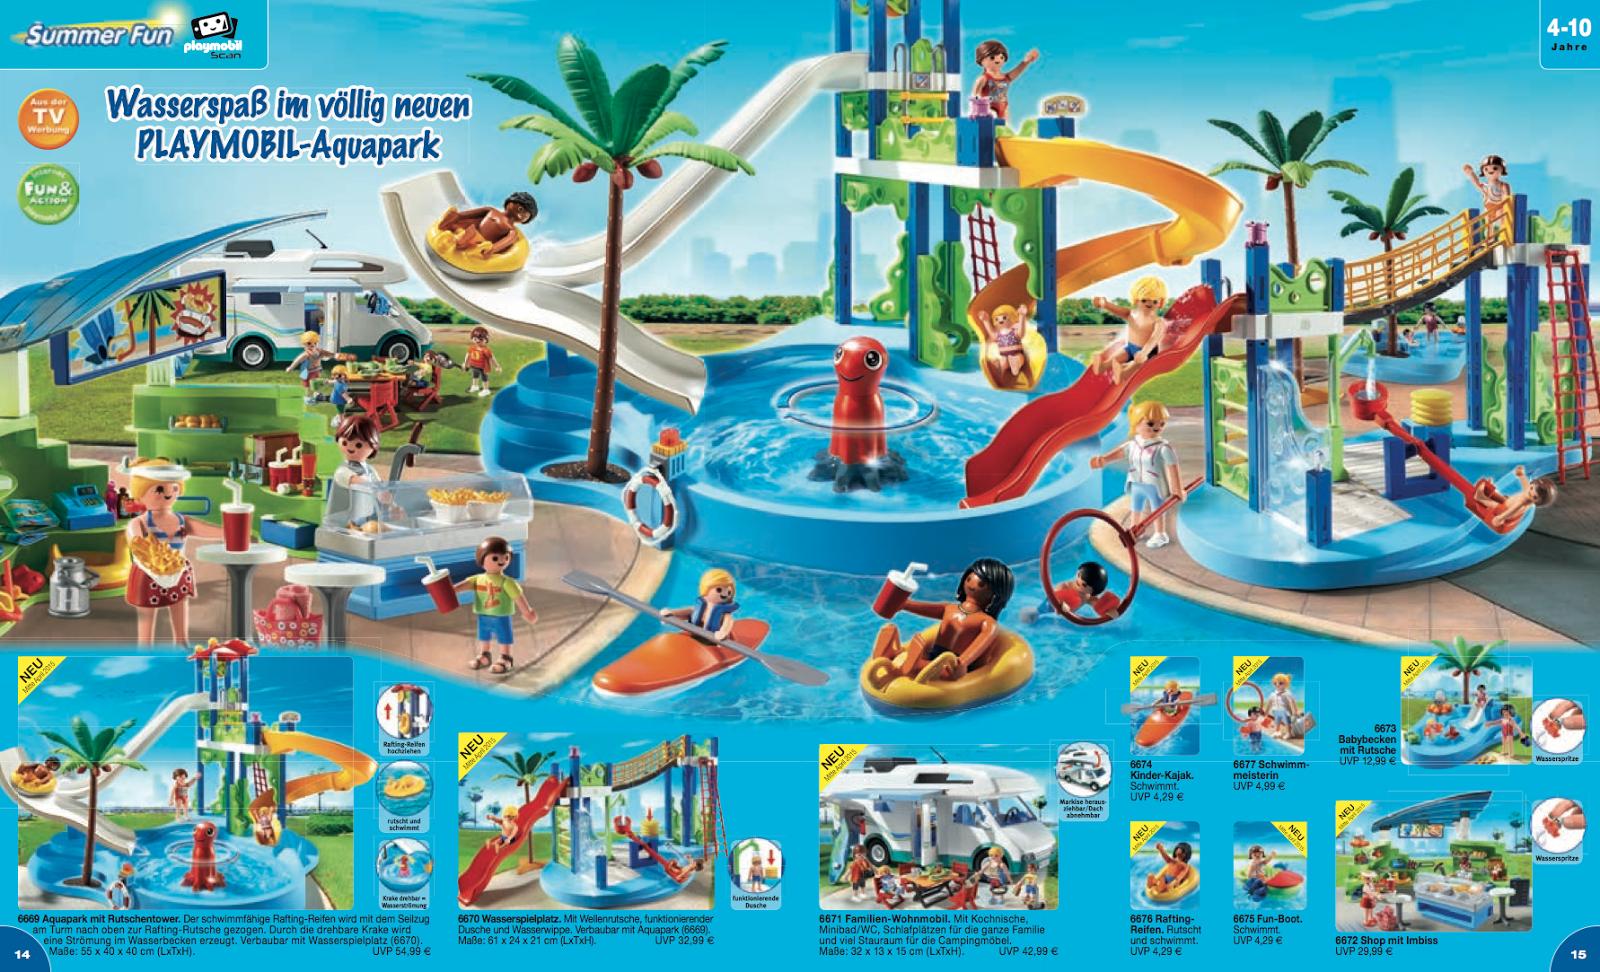 Les nouveaut s playmobil 2015 en attendant 2016 klerelo for Playmobil piscine toboggan